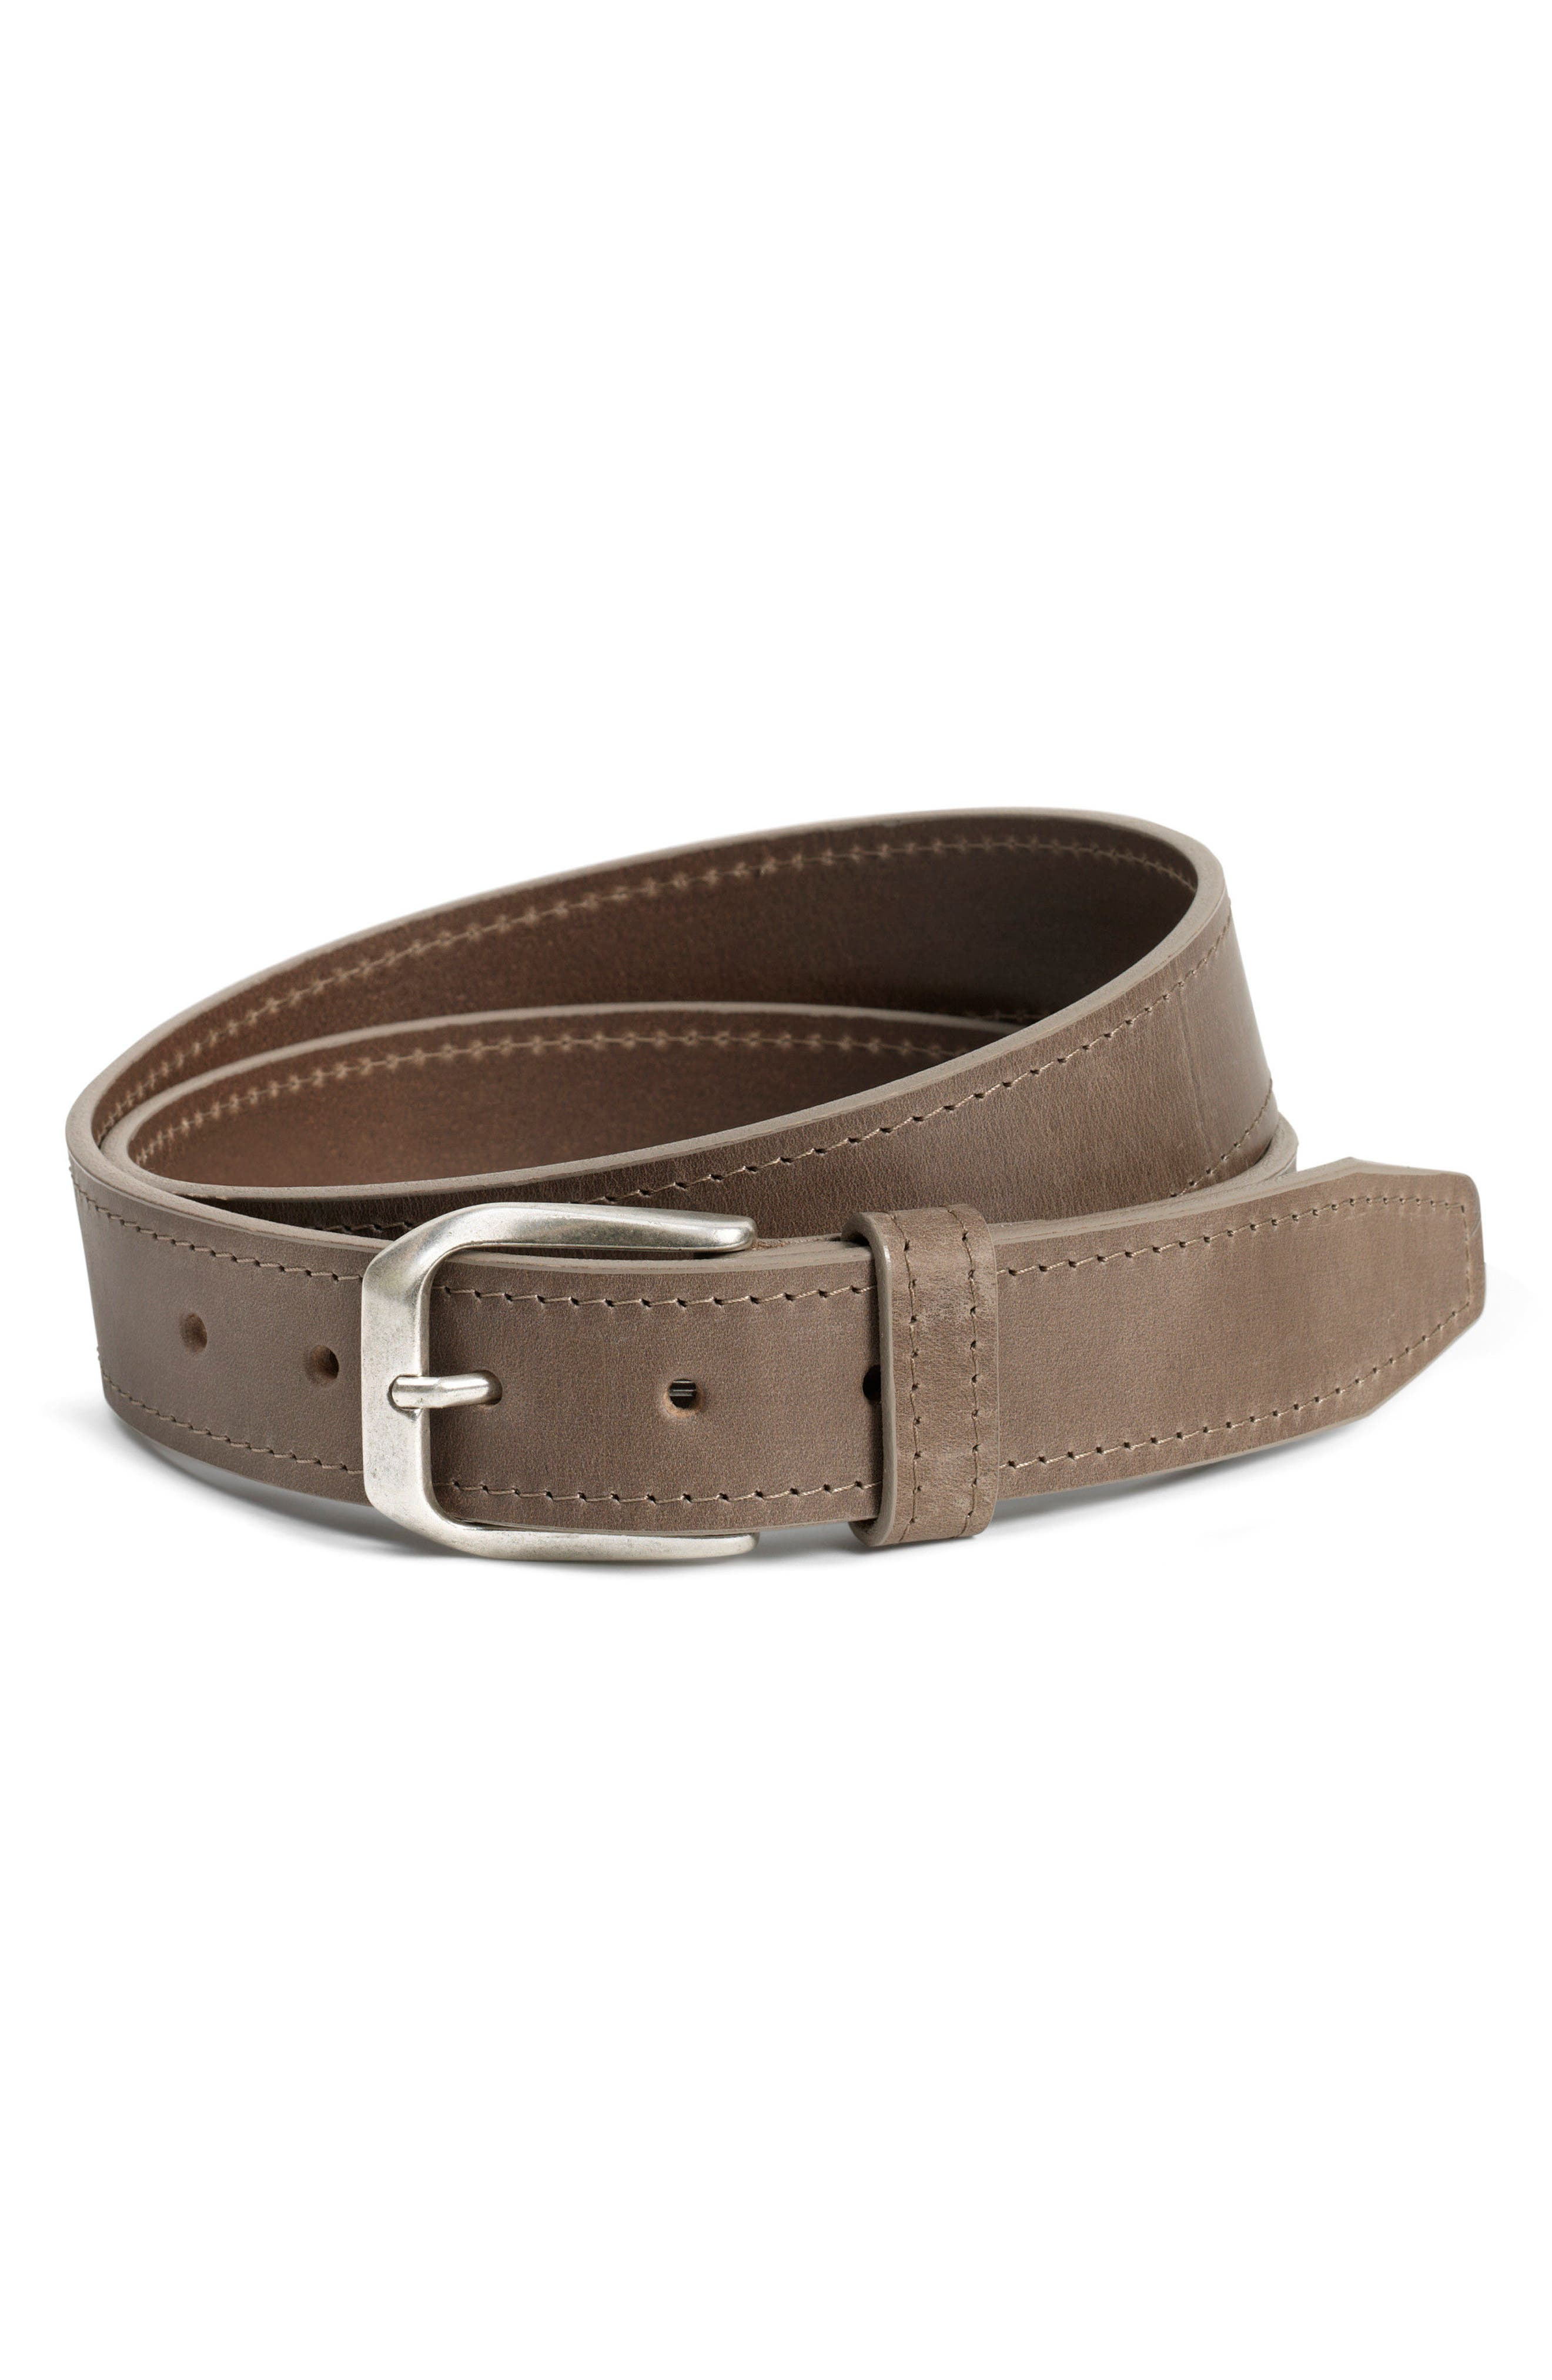 Trask Darby Leather Belt, Grey